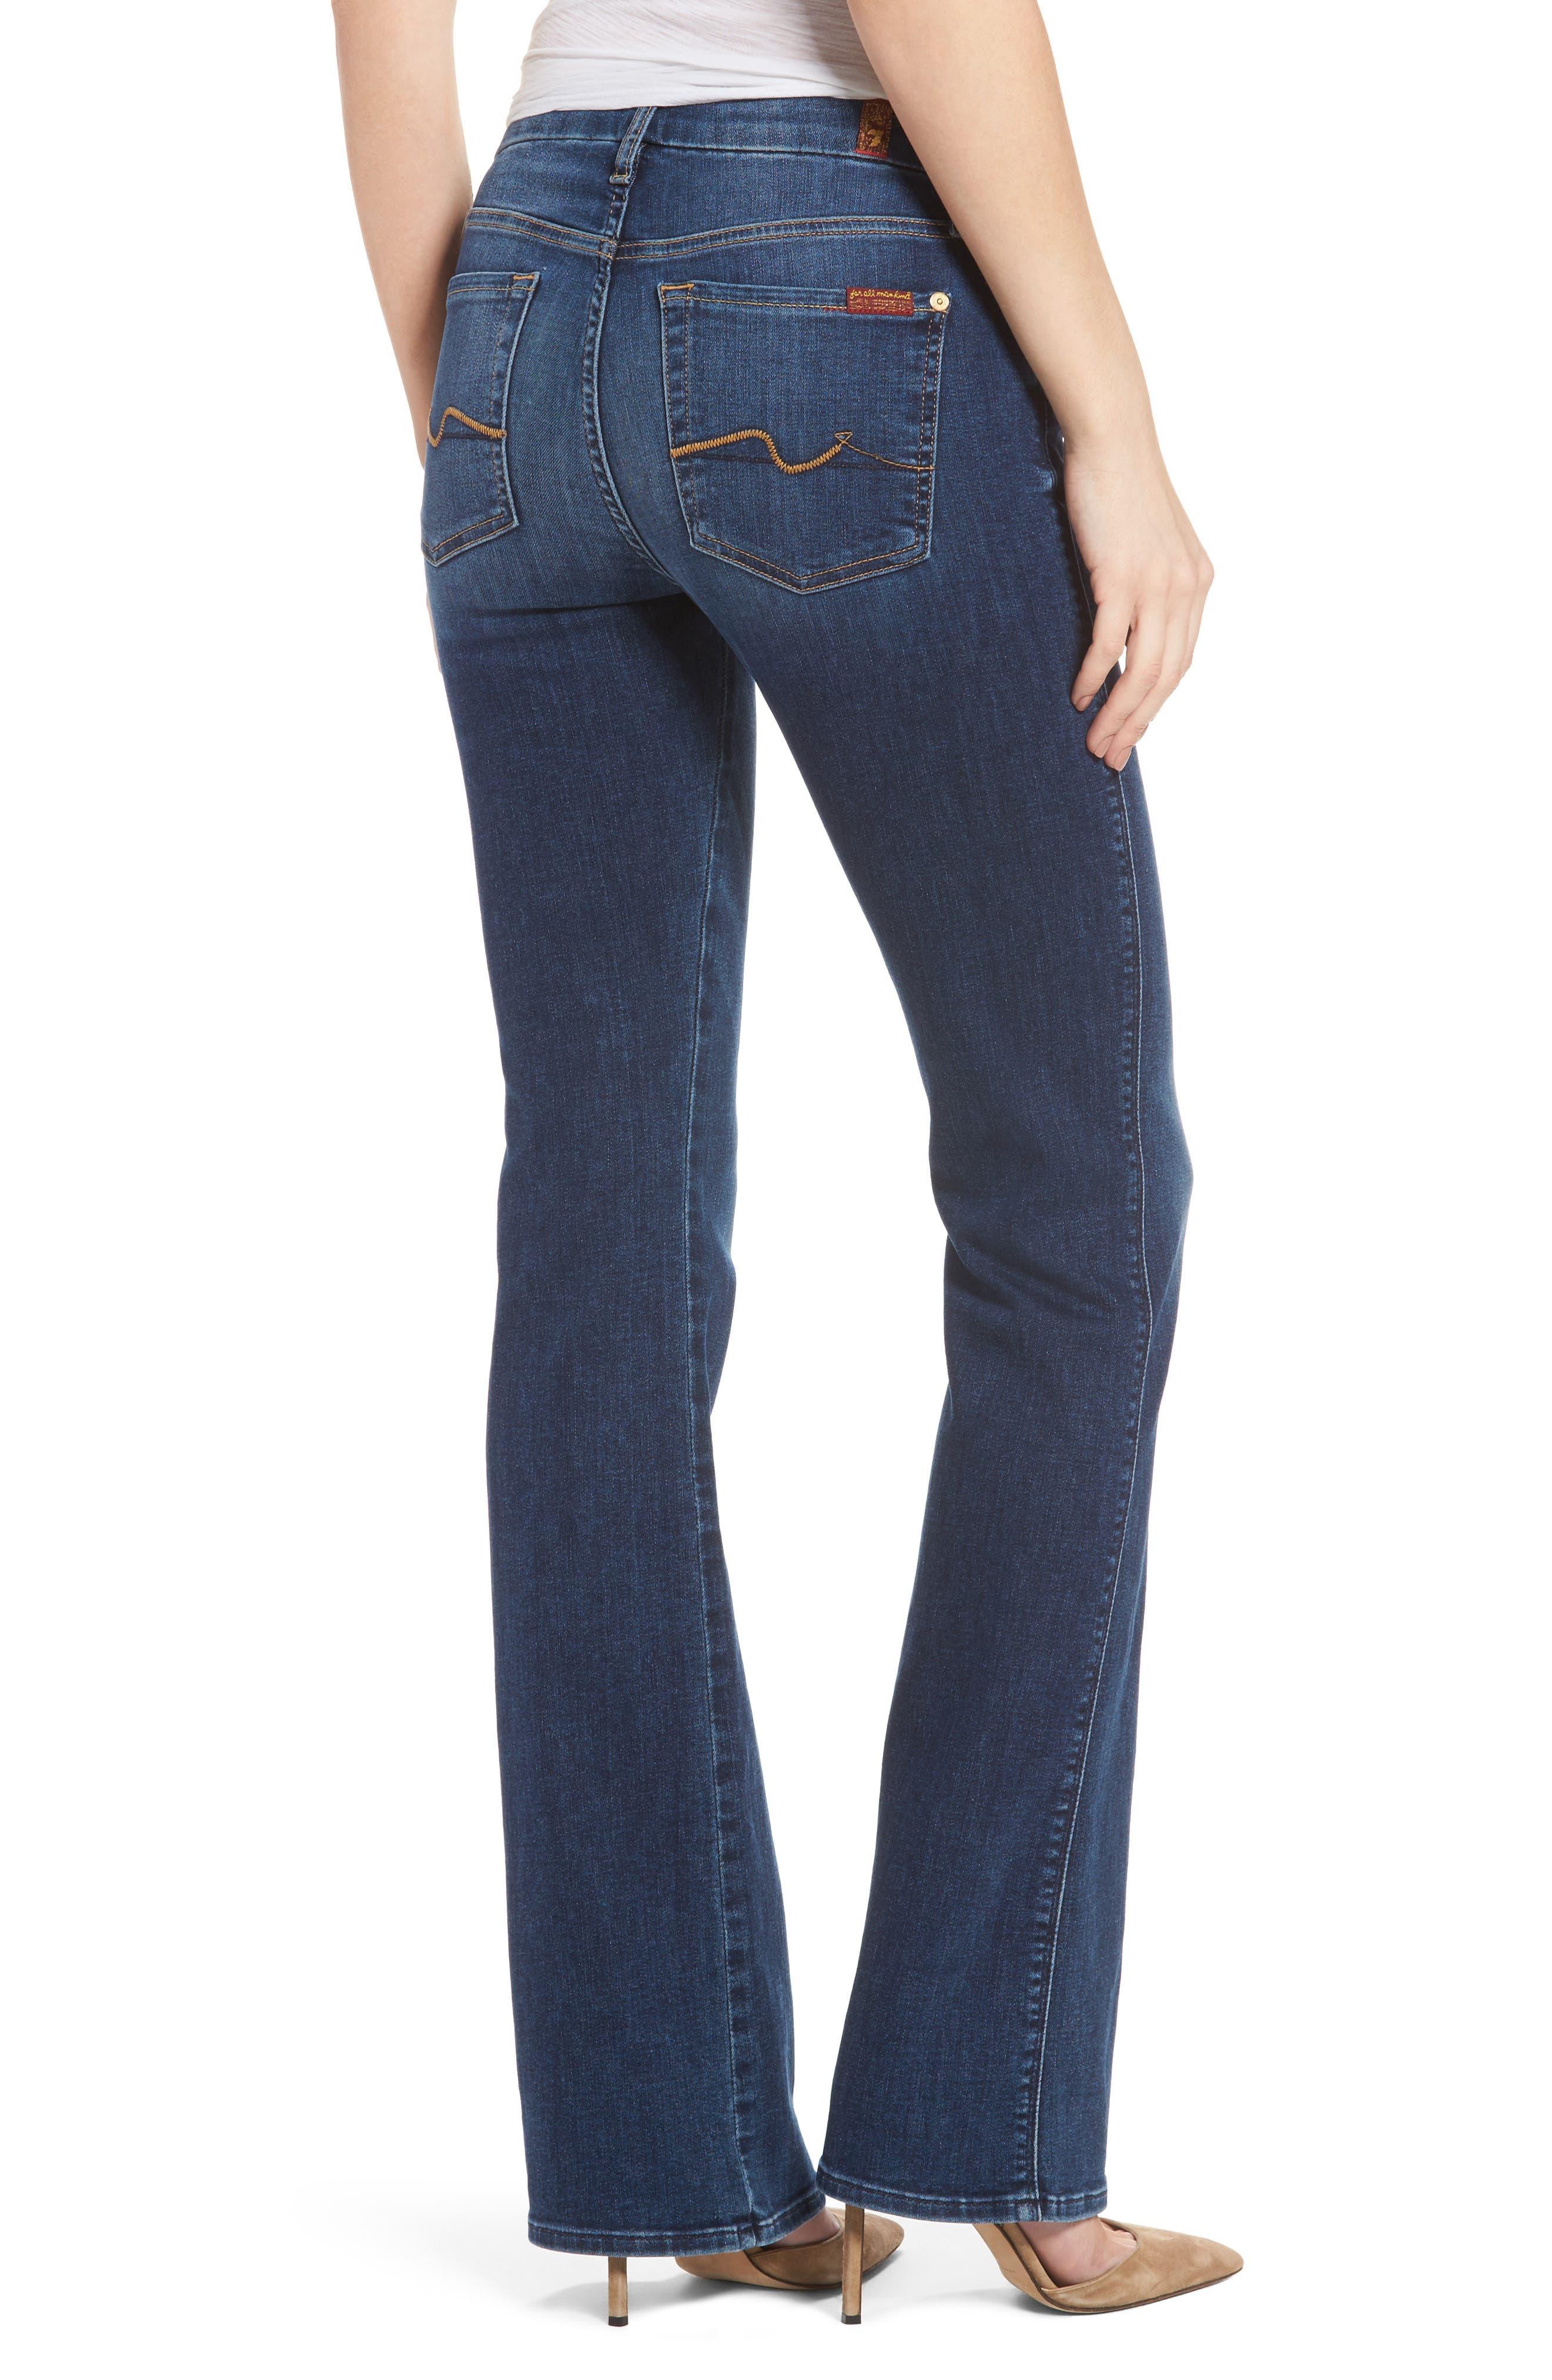 Kimmie Bootcut Jeans,                             Alternate thumbnail 2, color,                             400